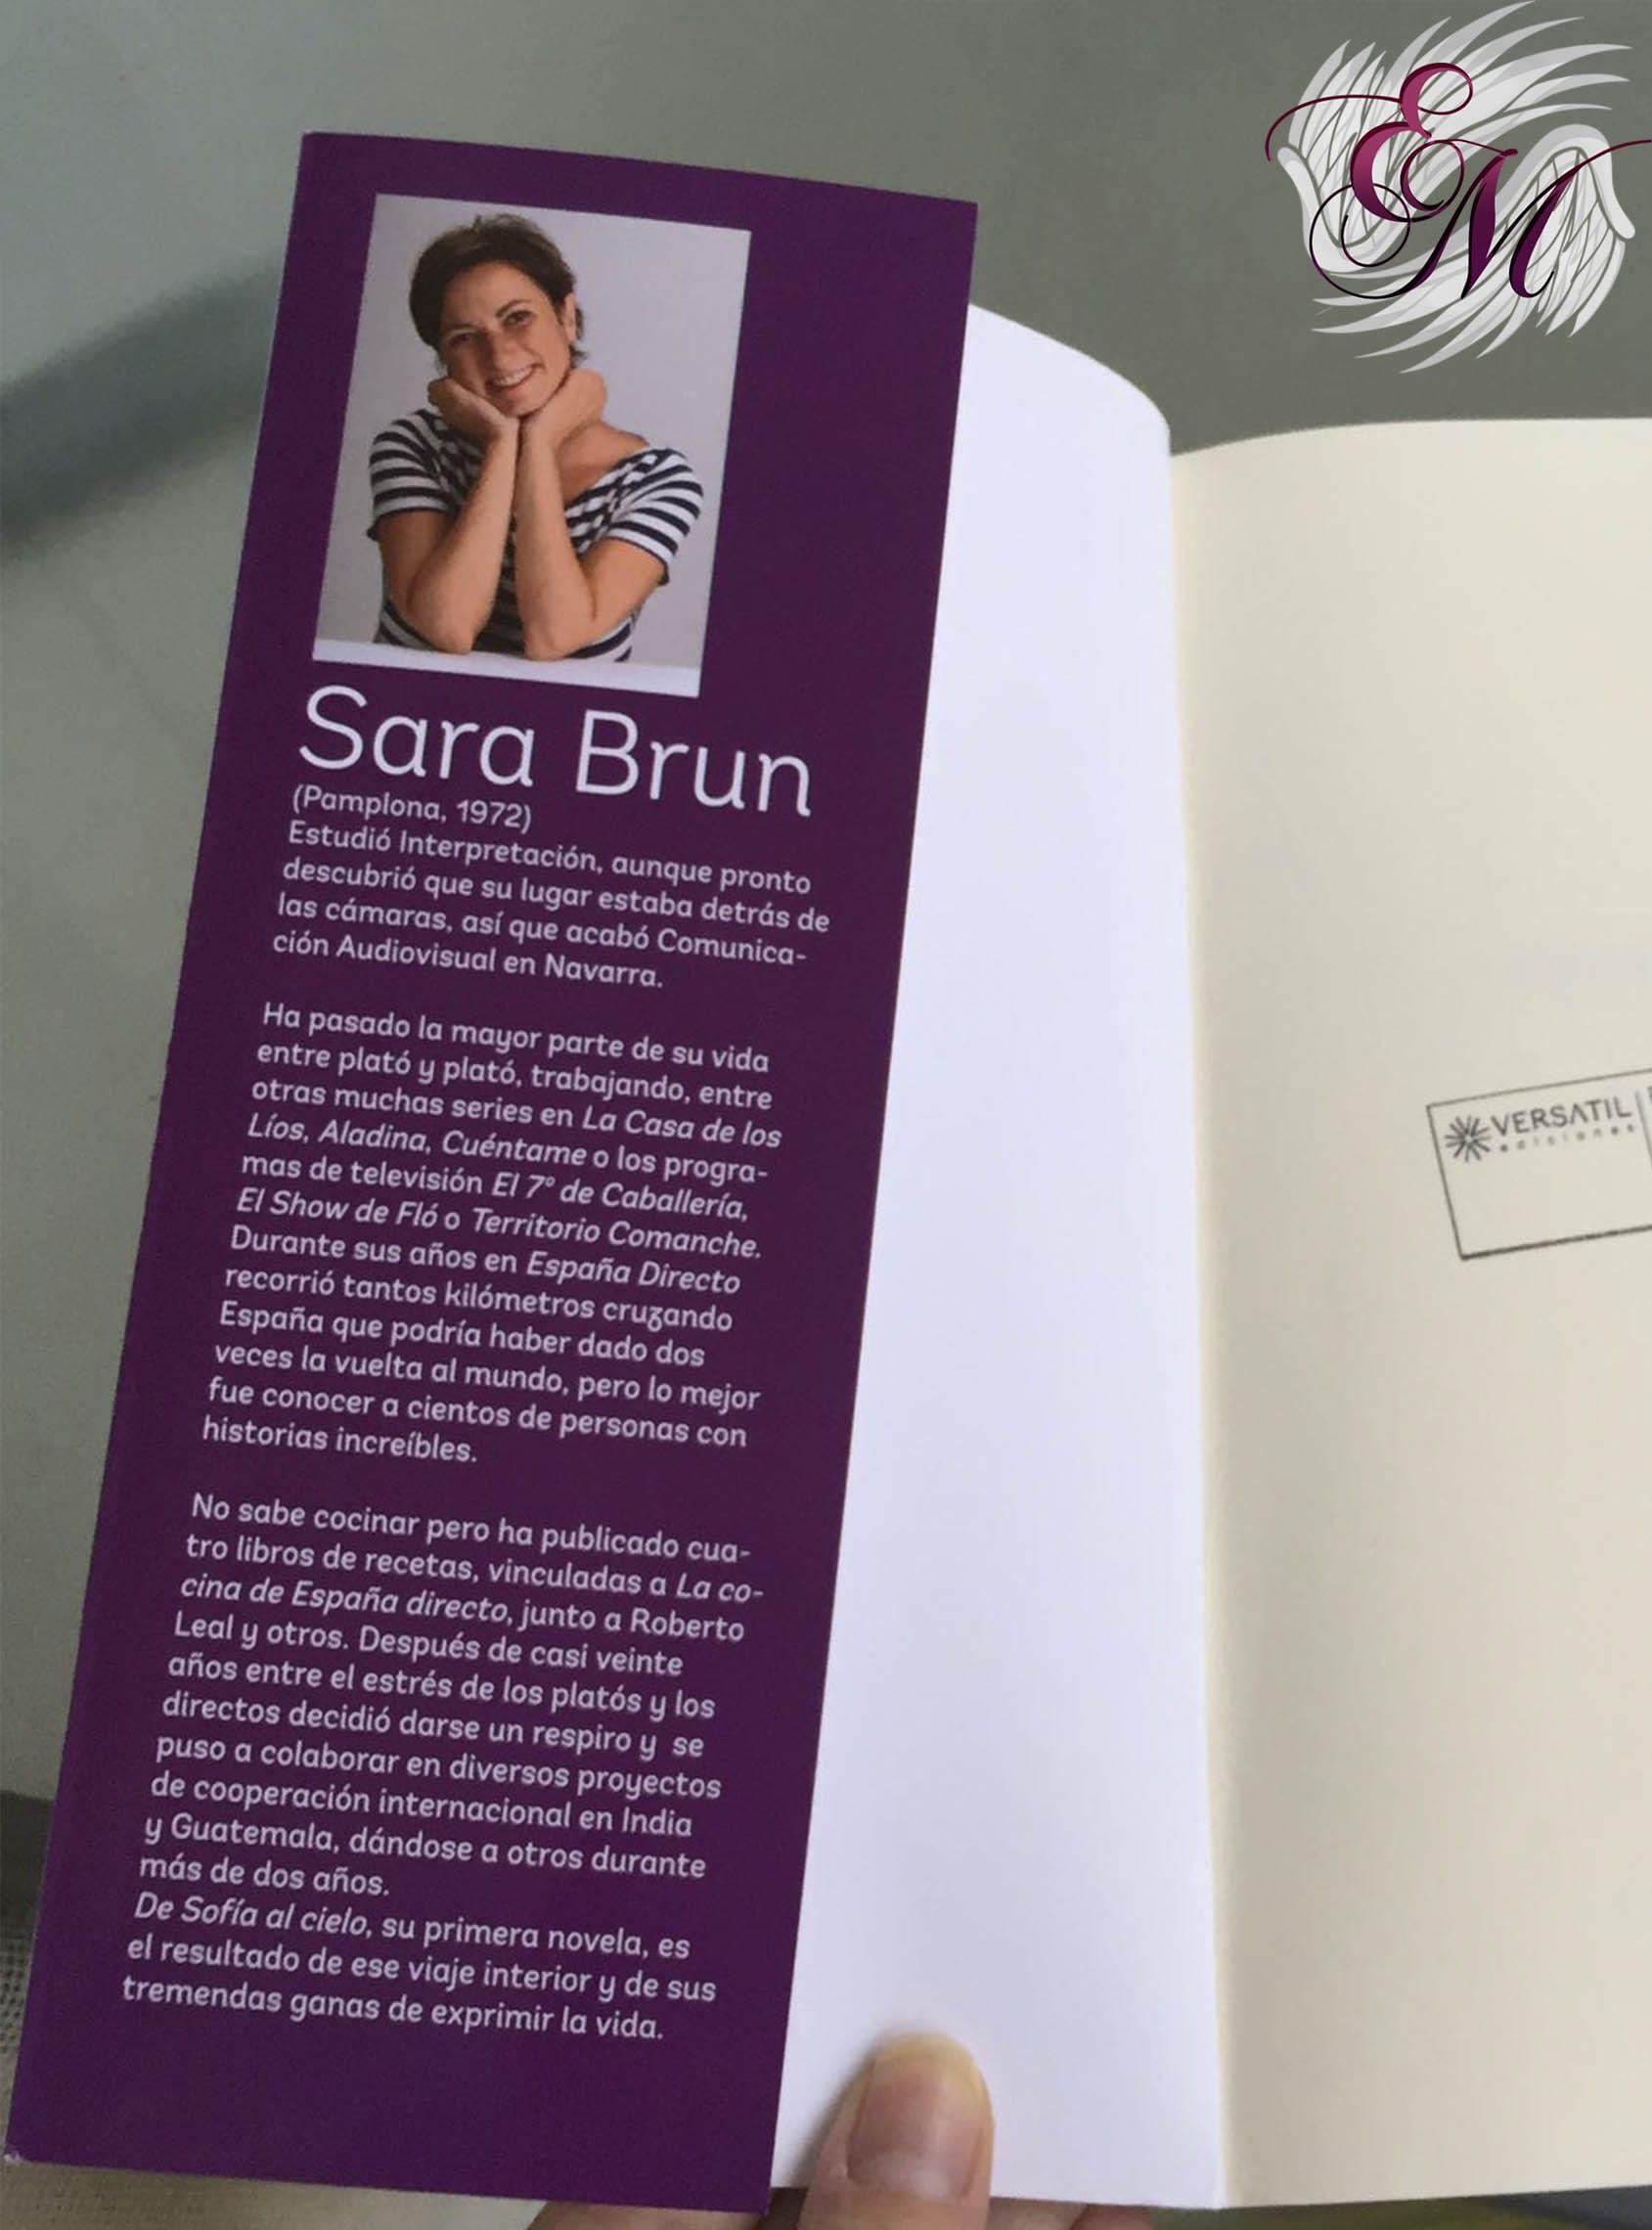 De Sofía al cielo, de Sara Brun - Reseña